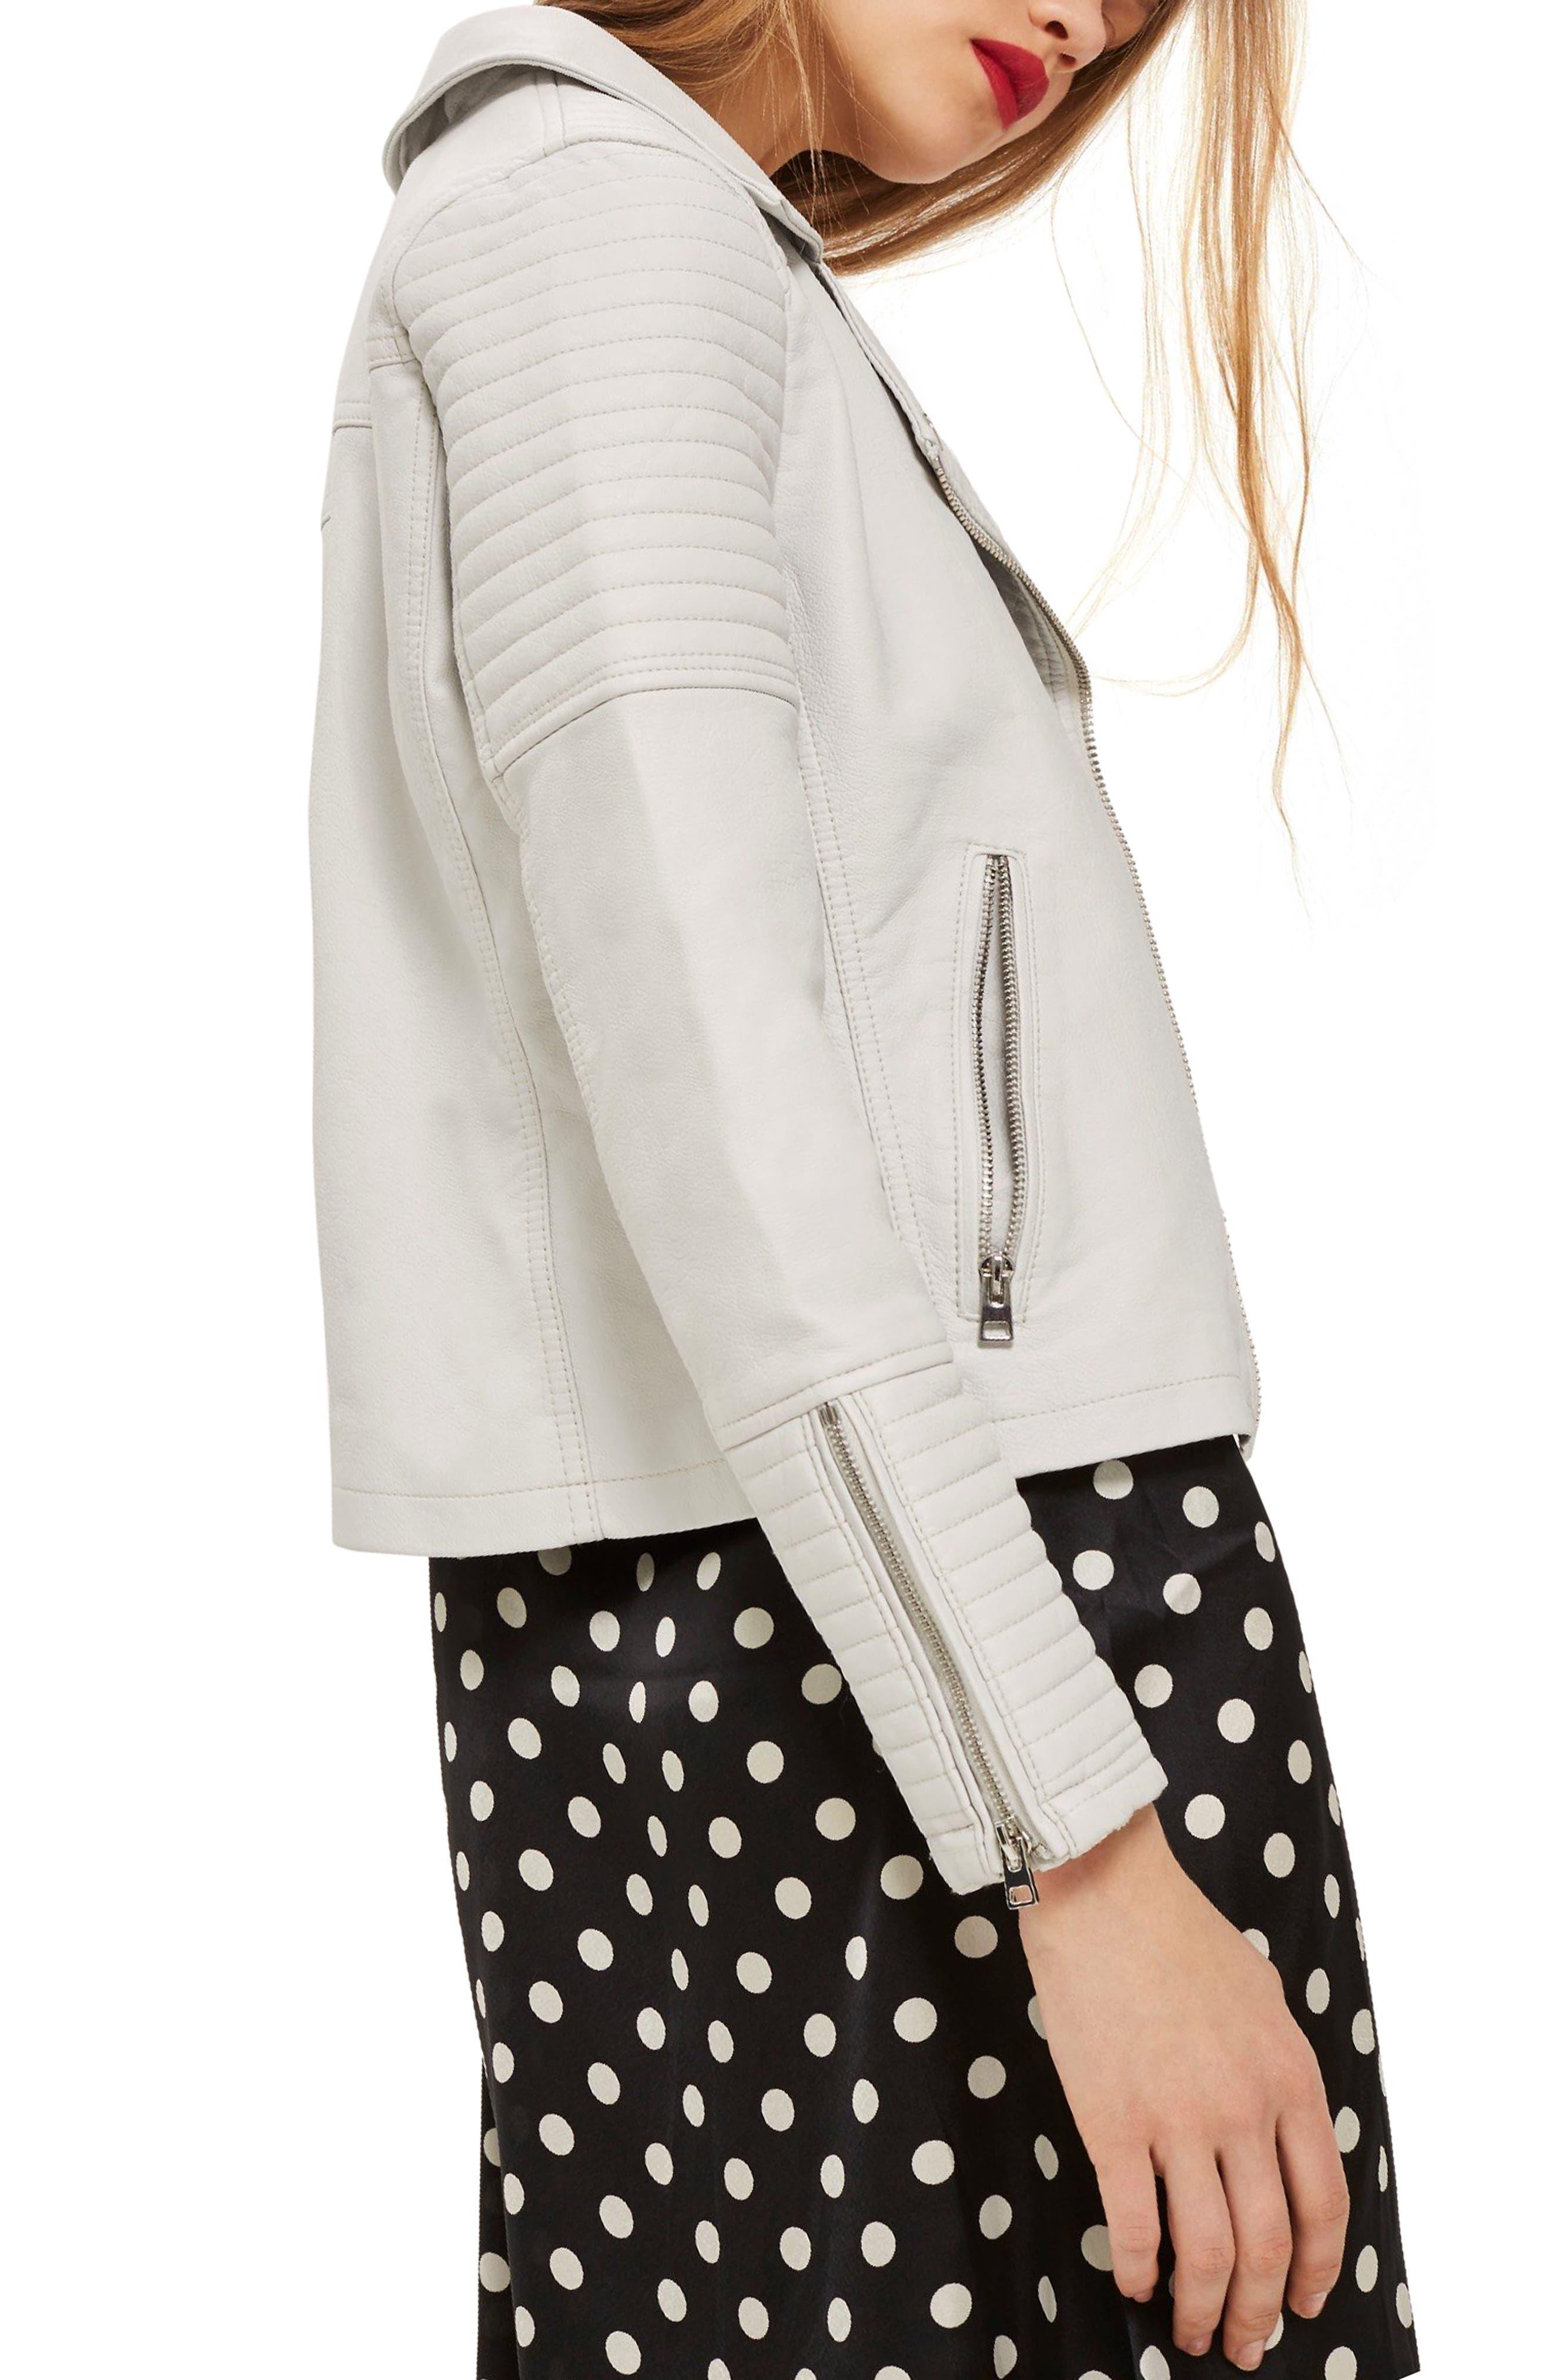 Rosa Biker Jacket,                             Alternate thumbnail 3, color,                             White